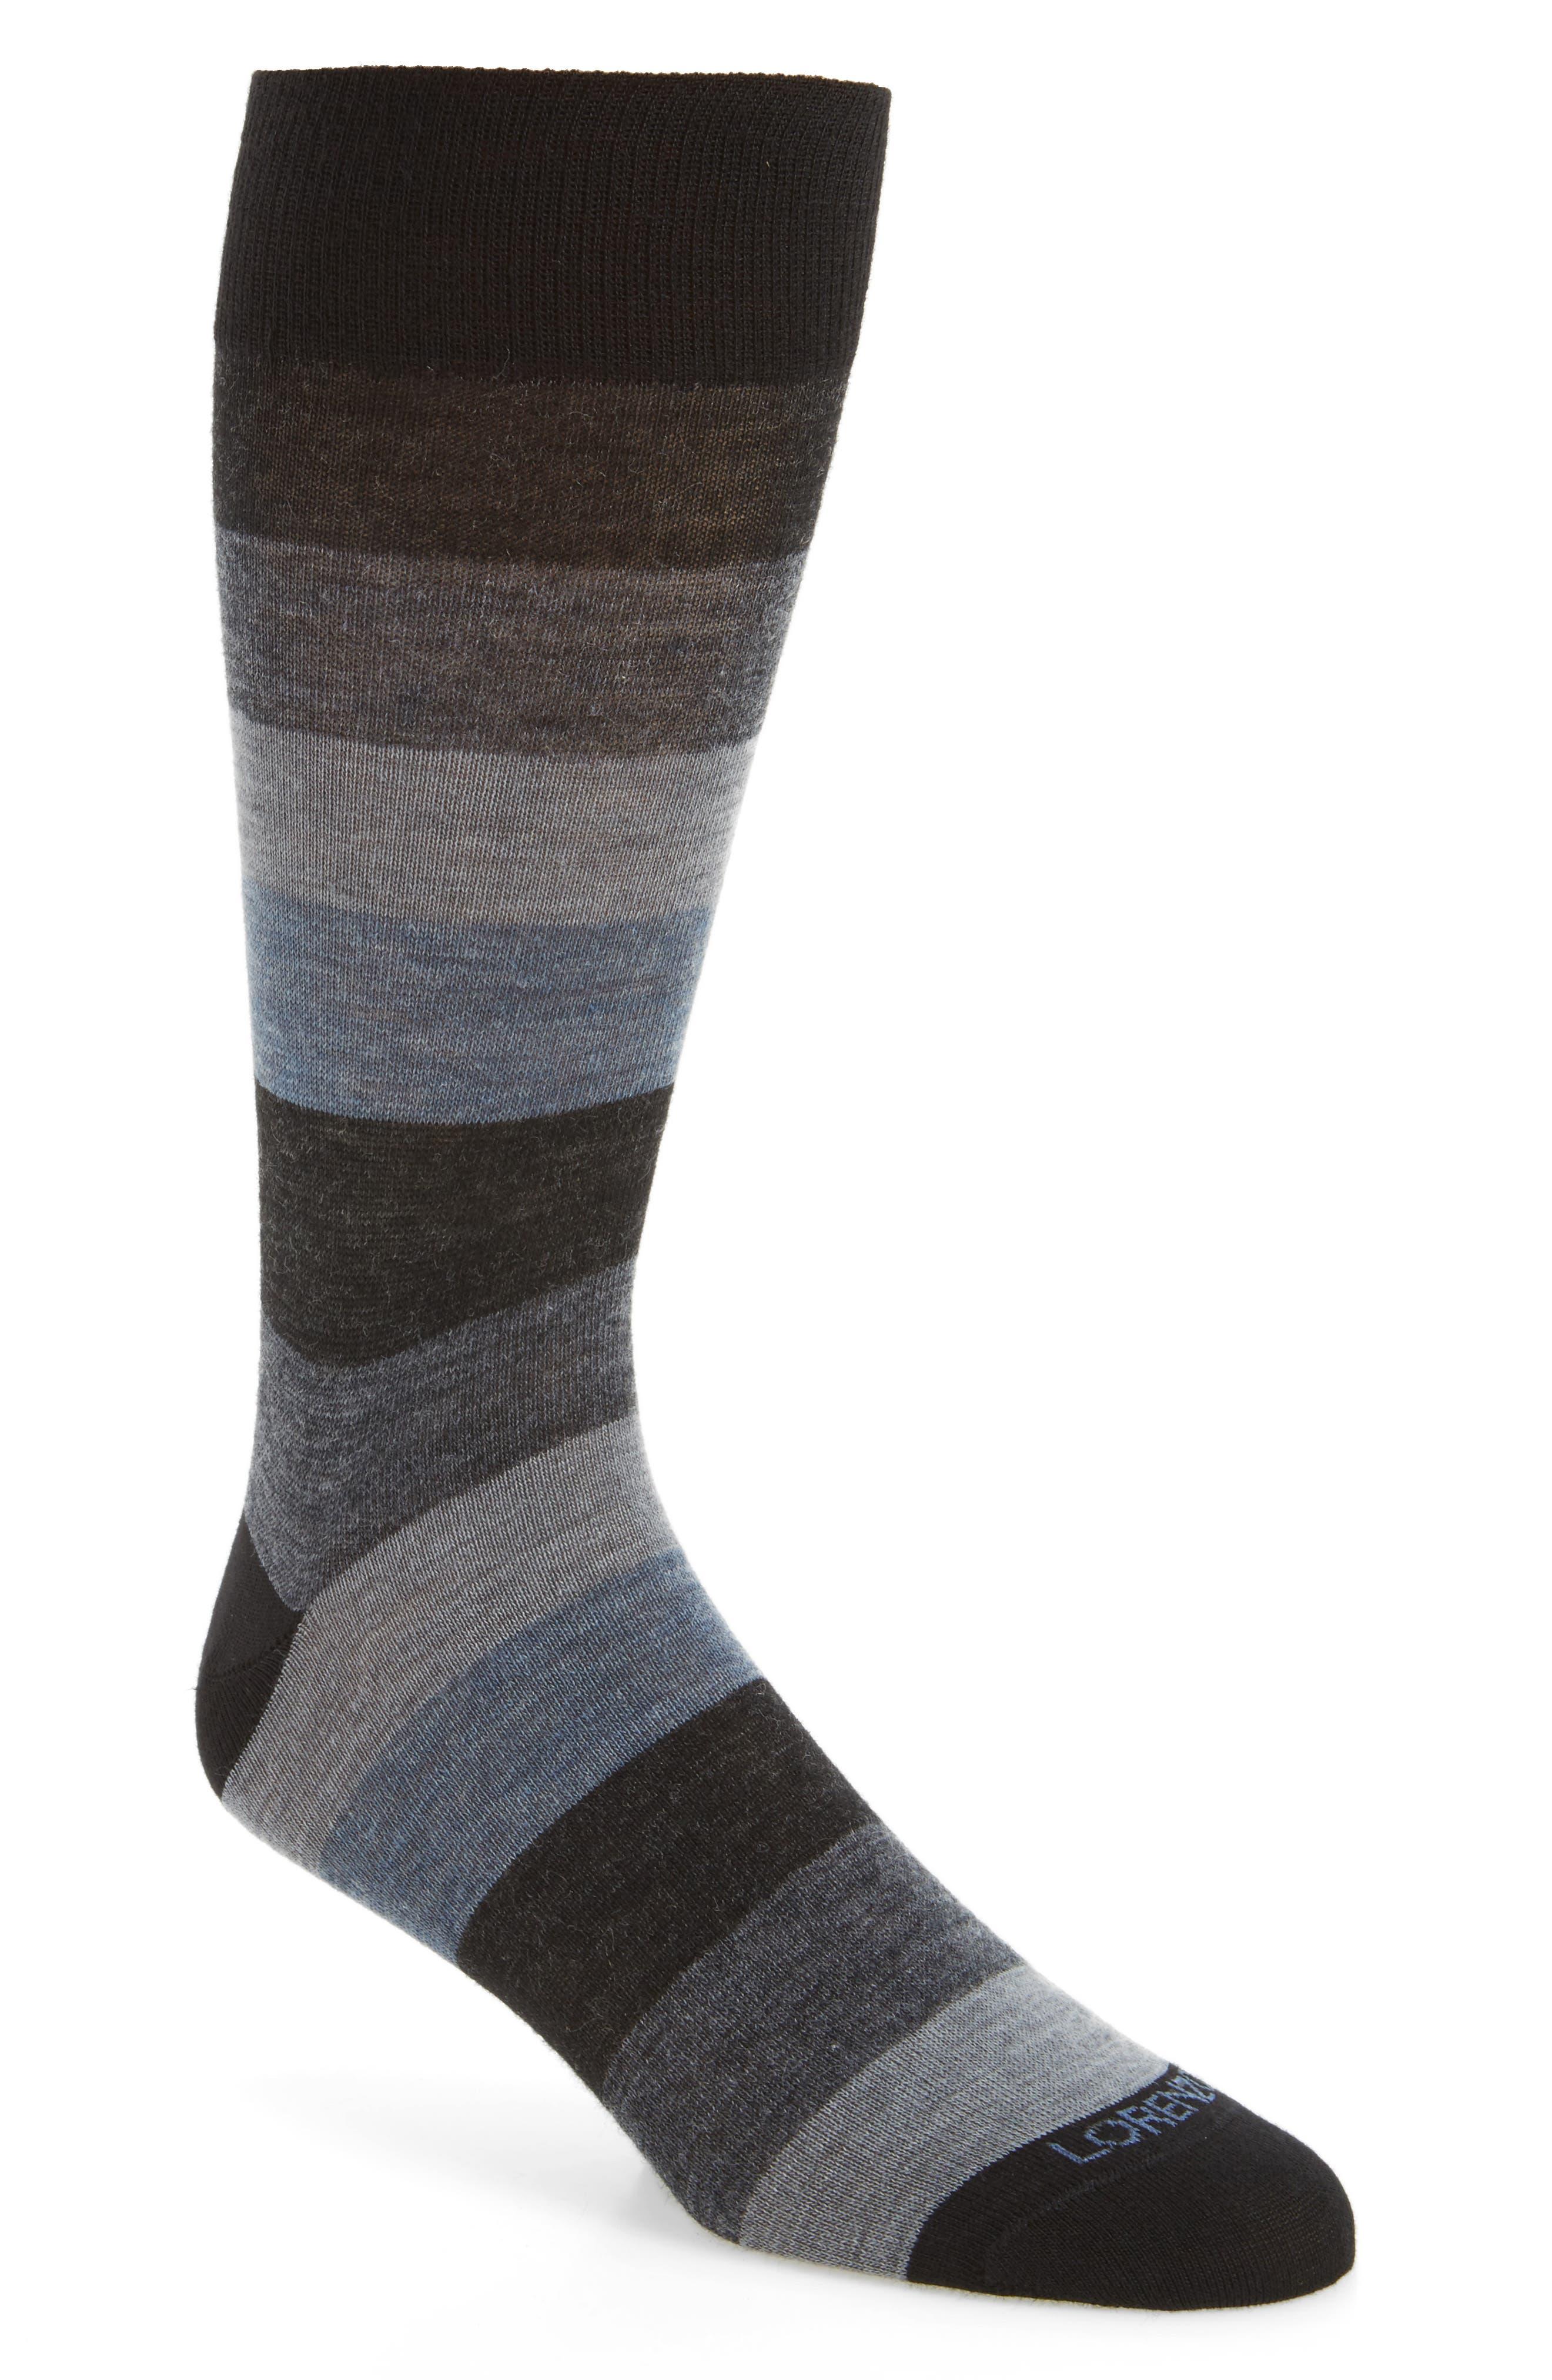 Lorenzo Uomo Colorblock Socks